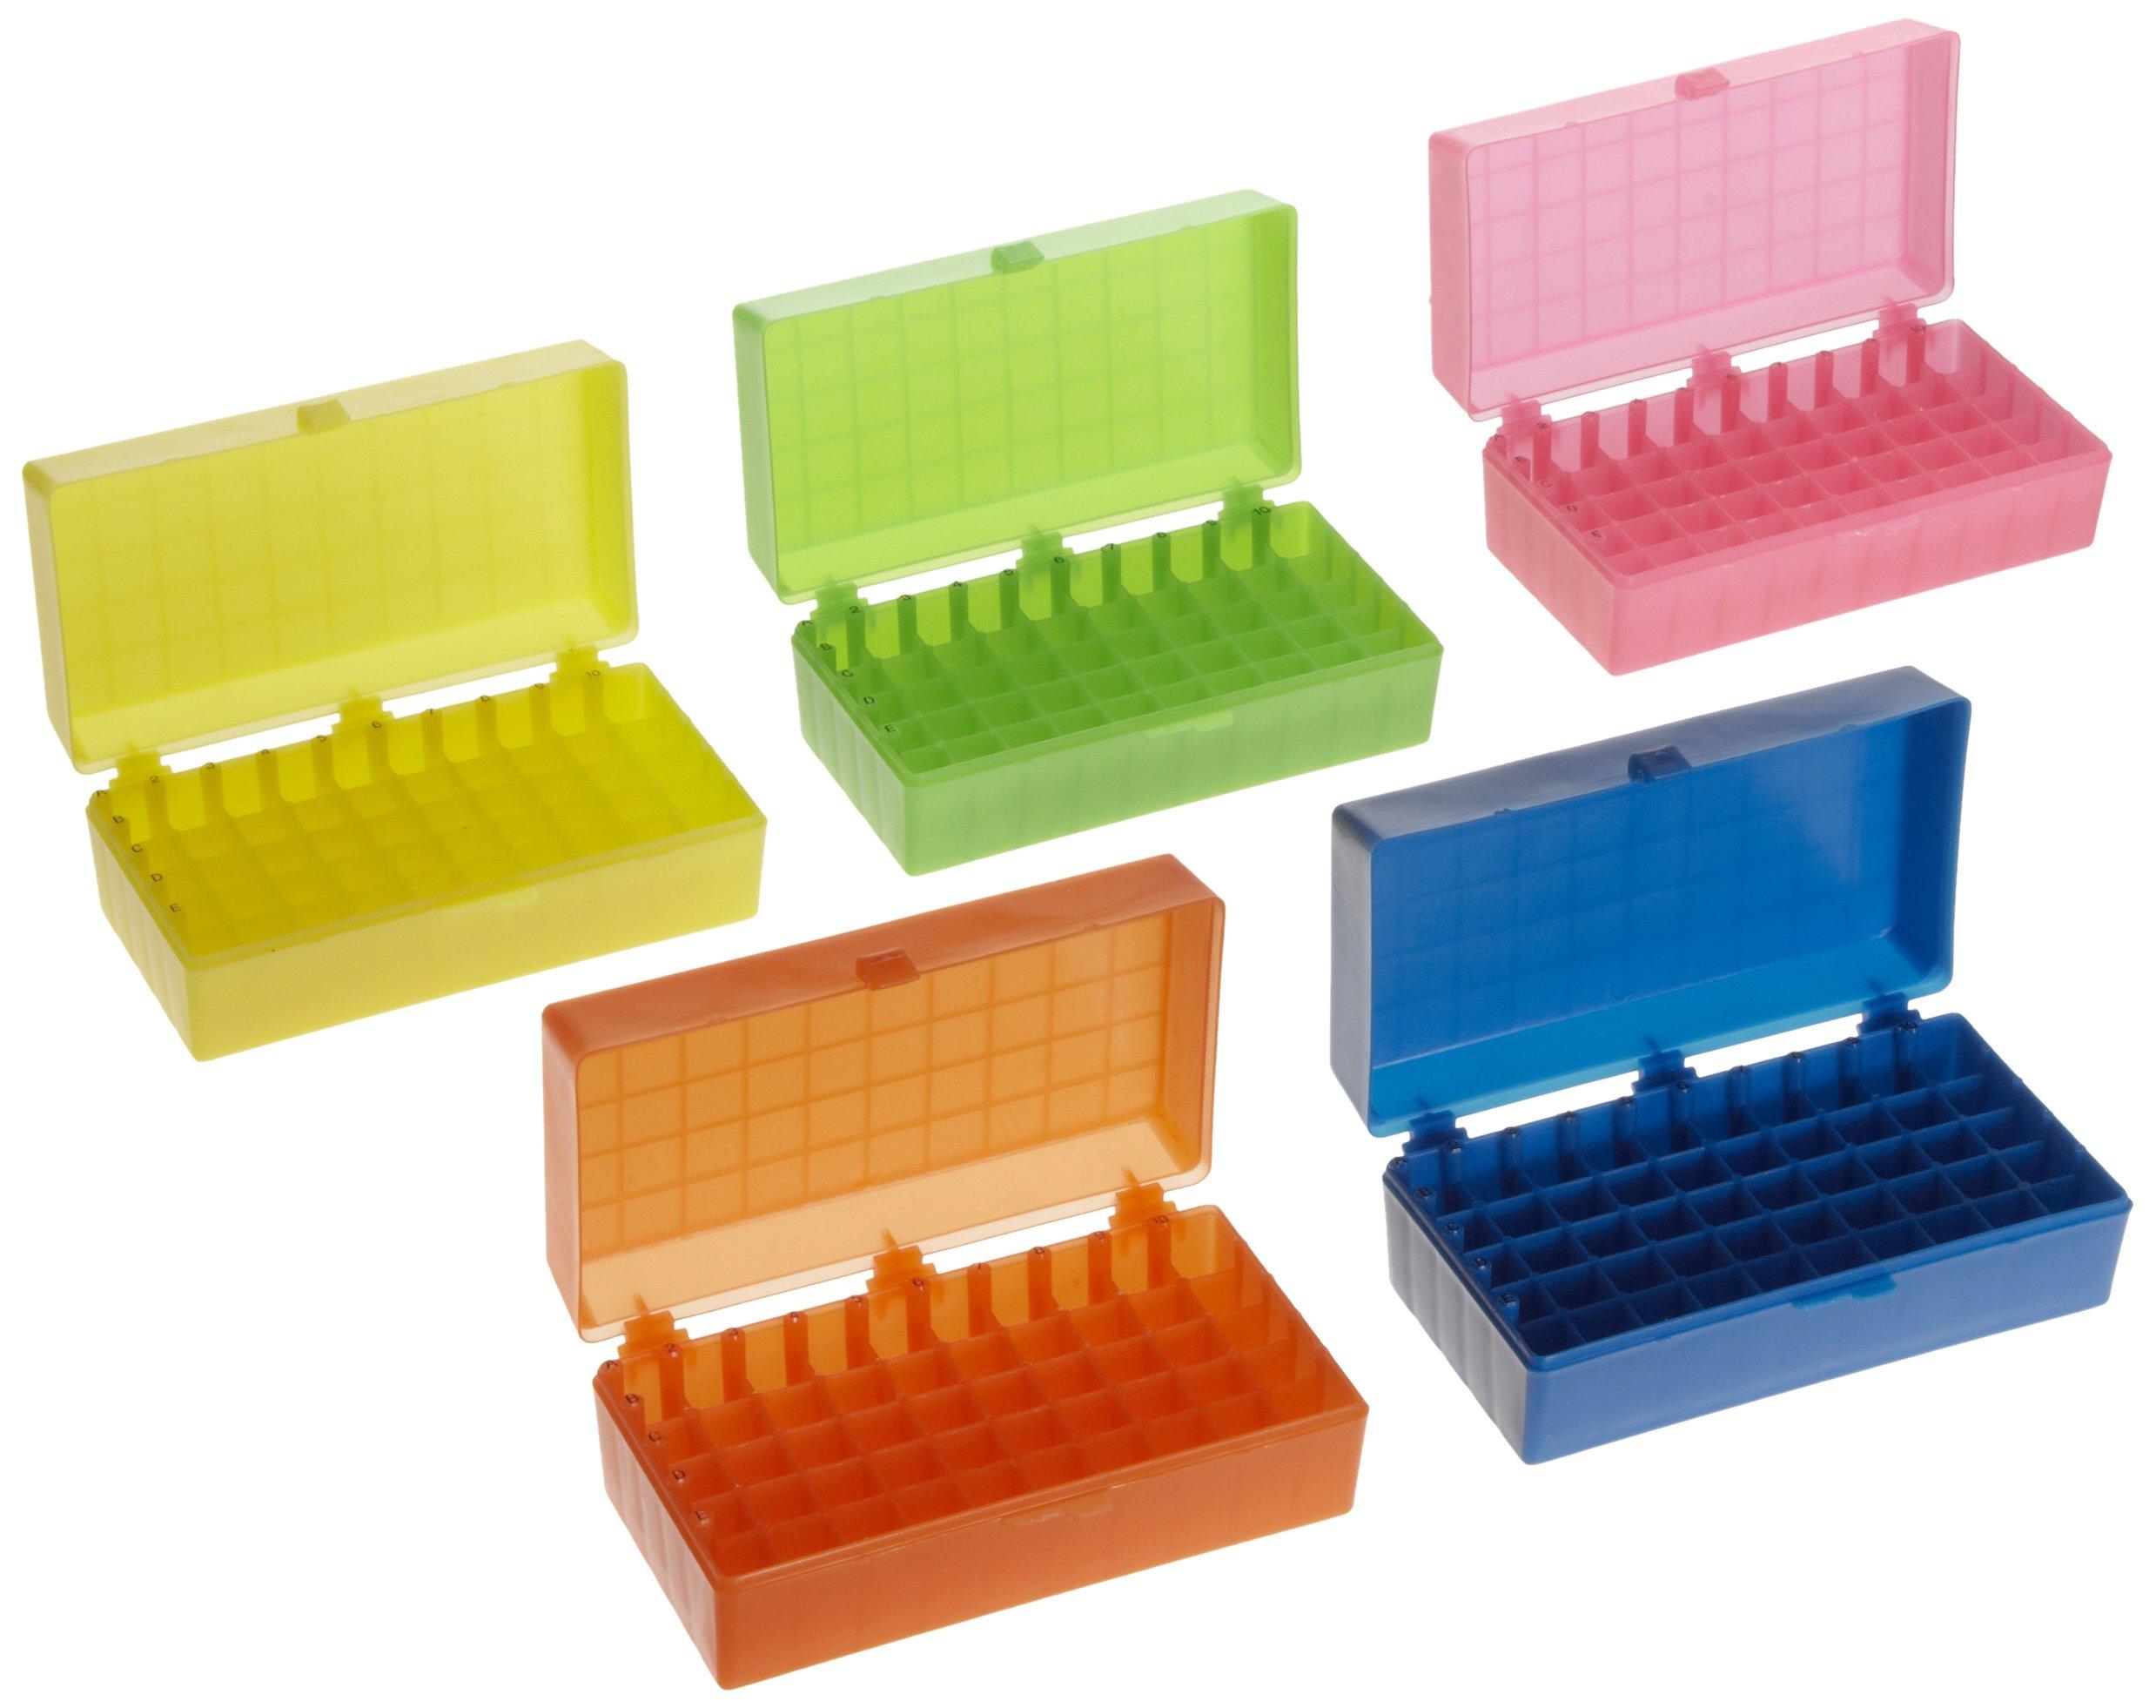 Heathrow Scientific HS120033 50 Well Microtube Storage Box, Cryogenic Box, Tube Storage, 1.5mL/2.0mL Tubes,Polypropylene, 5 Assorted Colors, (5/pk)